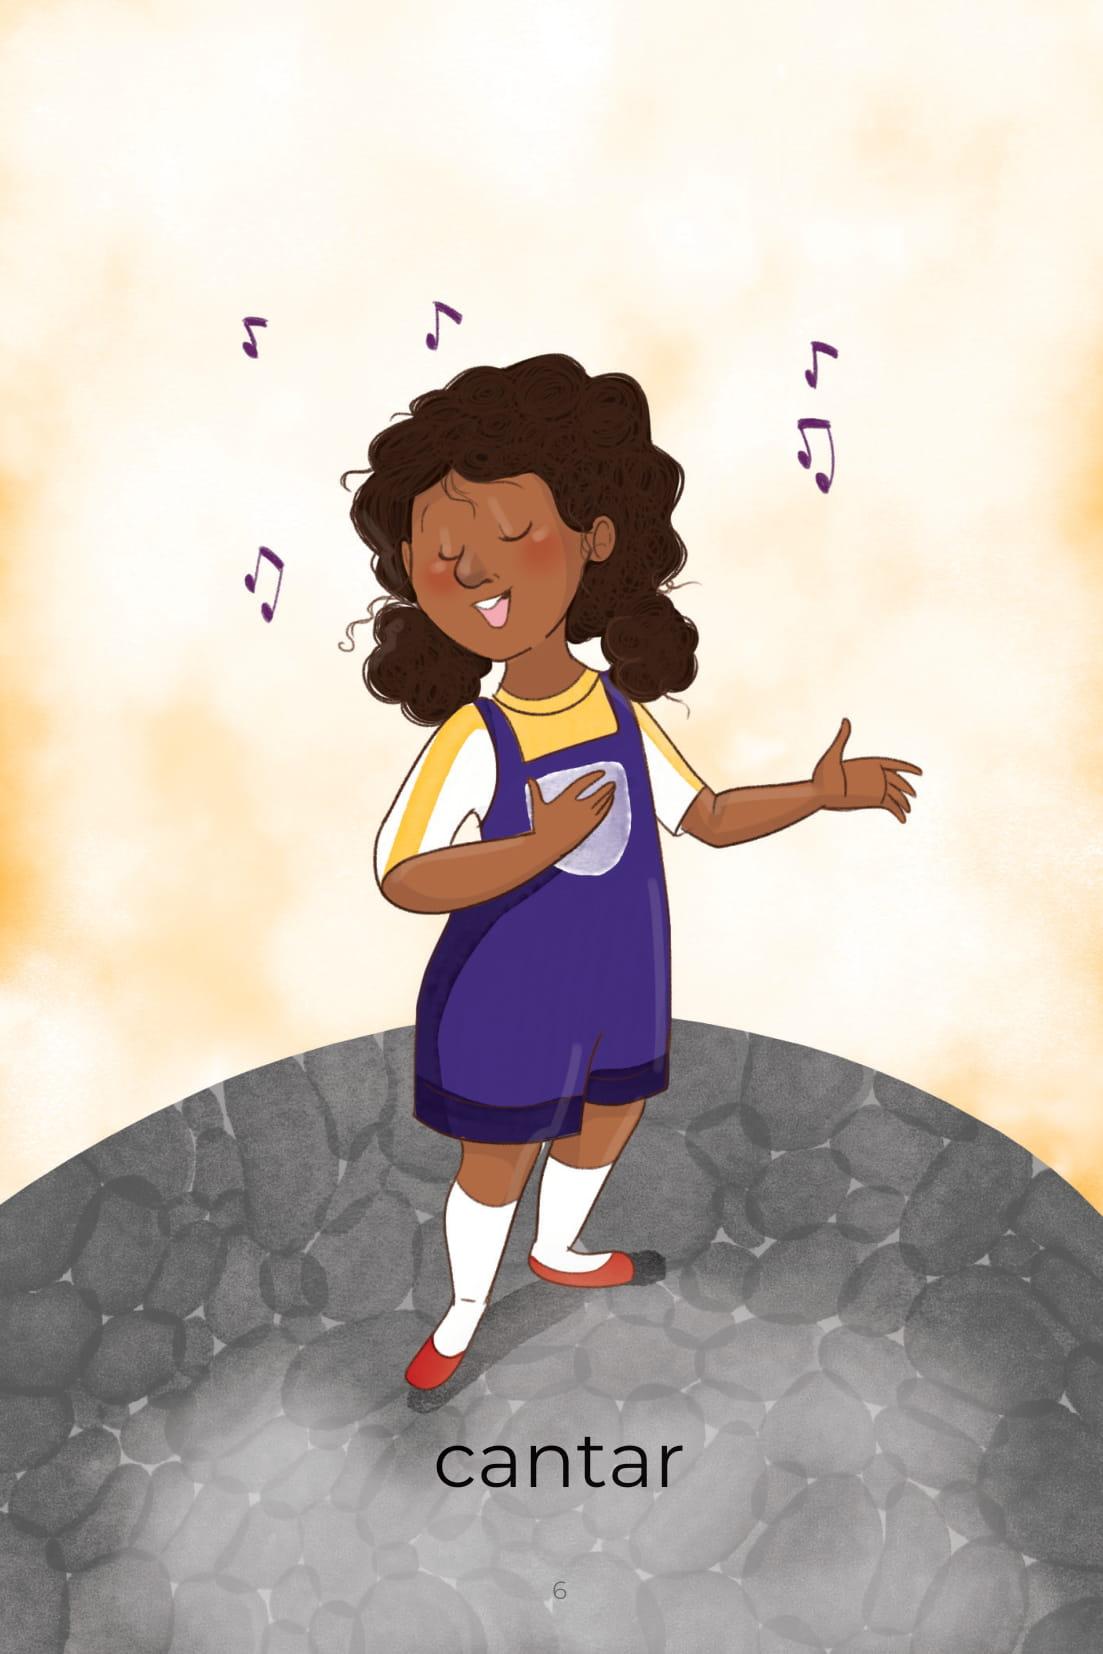 Atividades do Dia a Dia Cantar